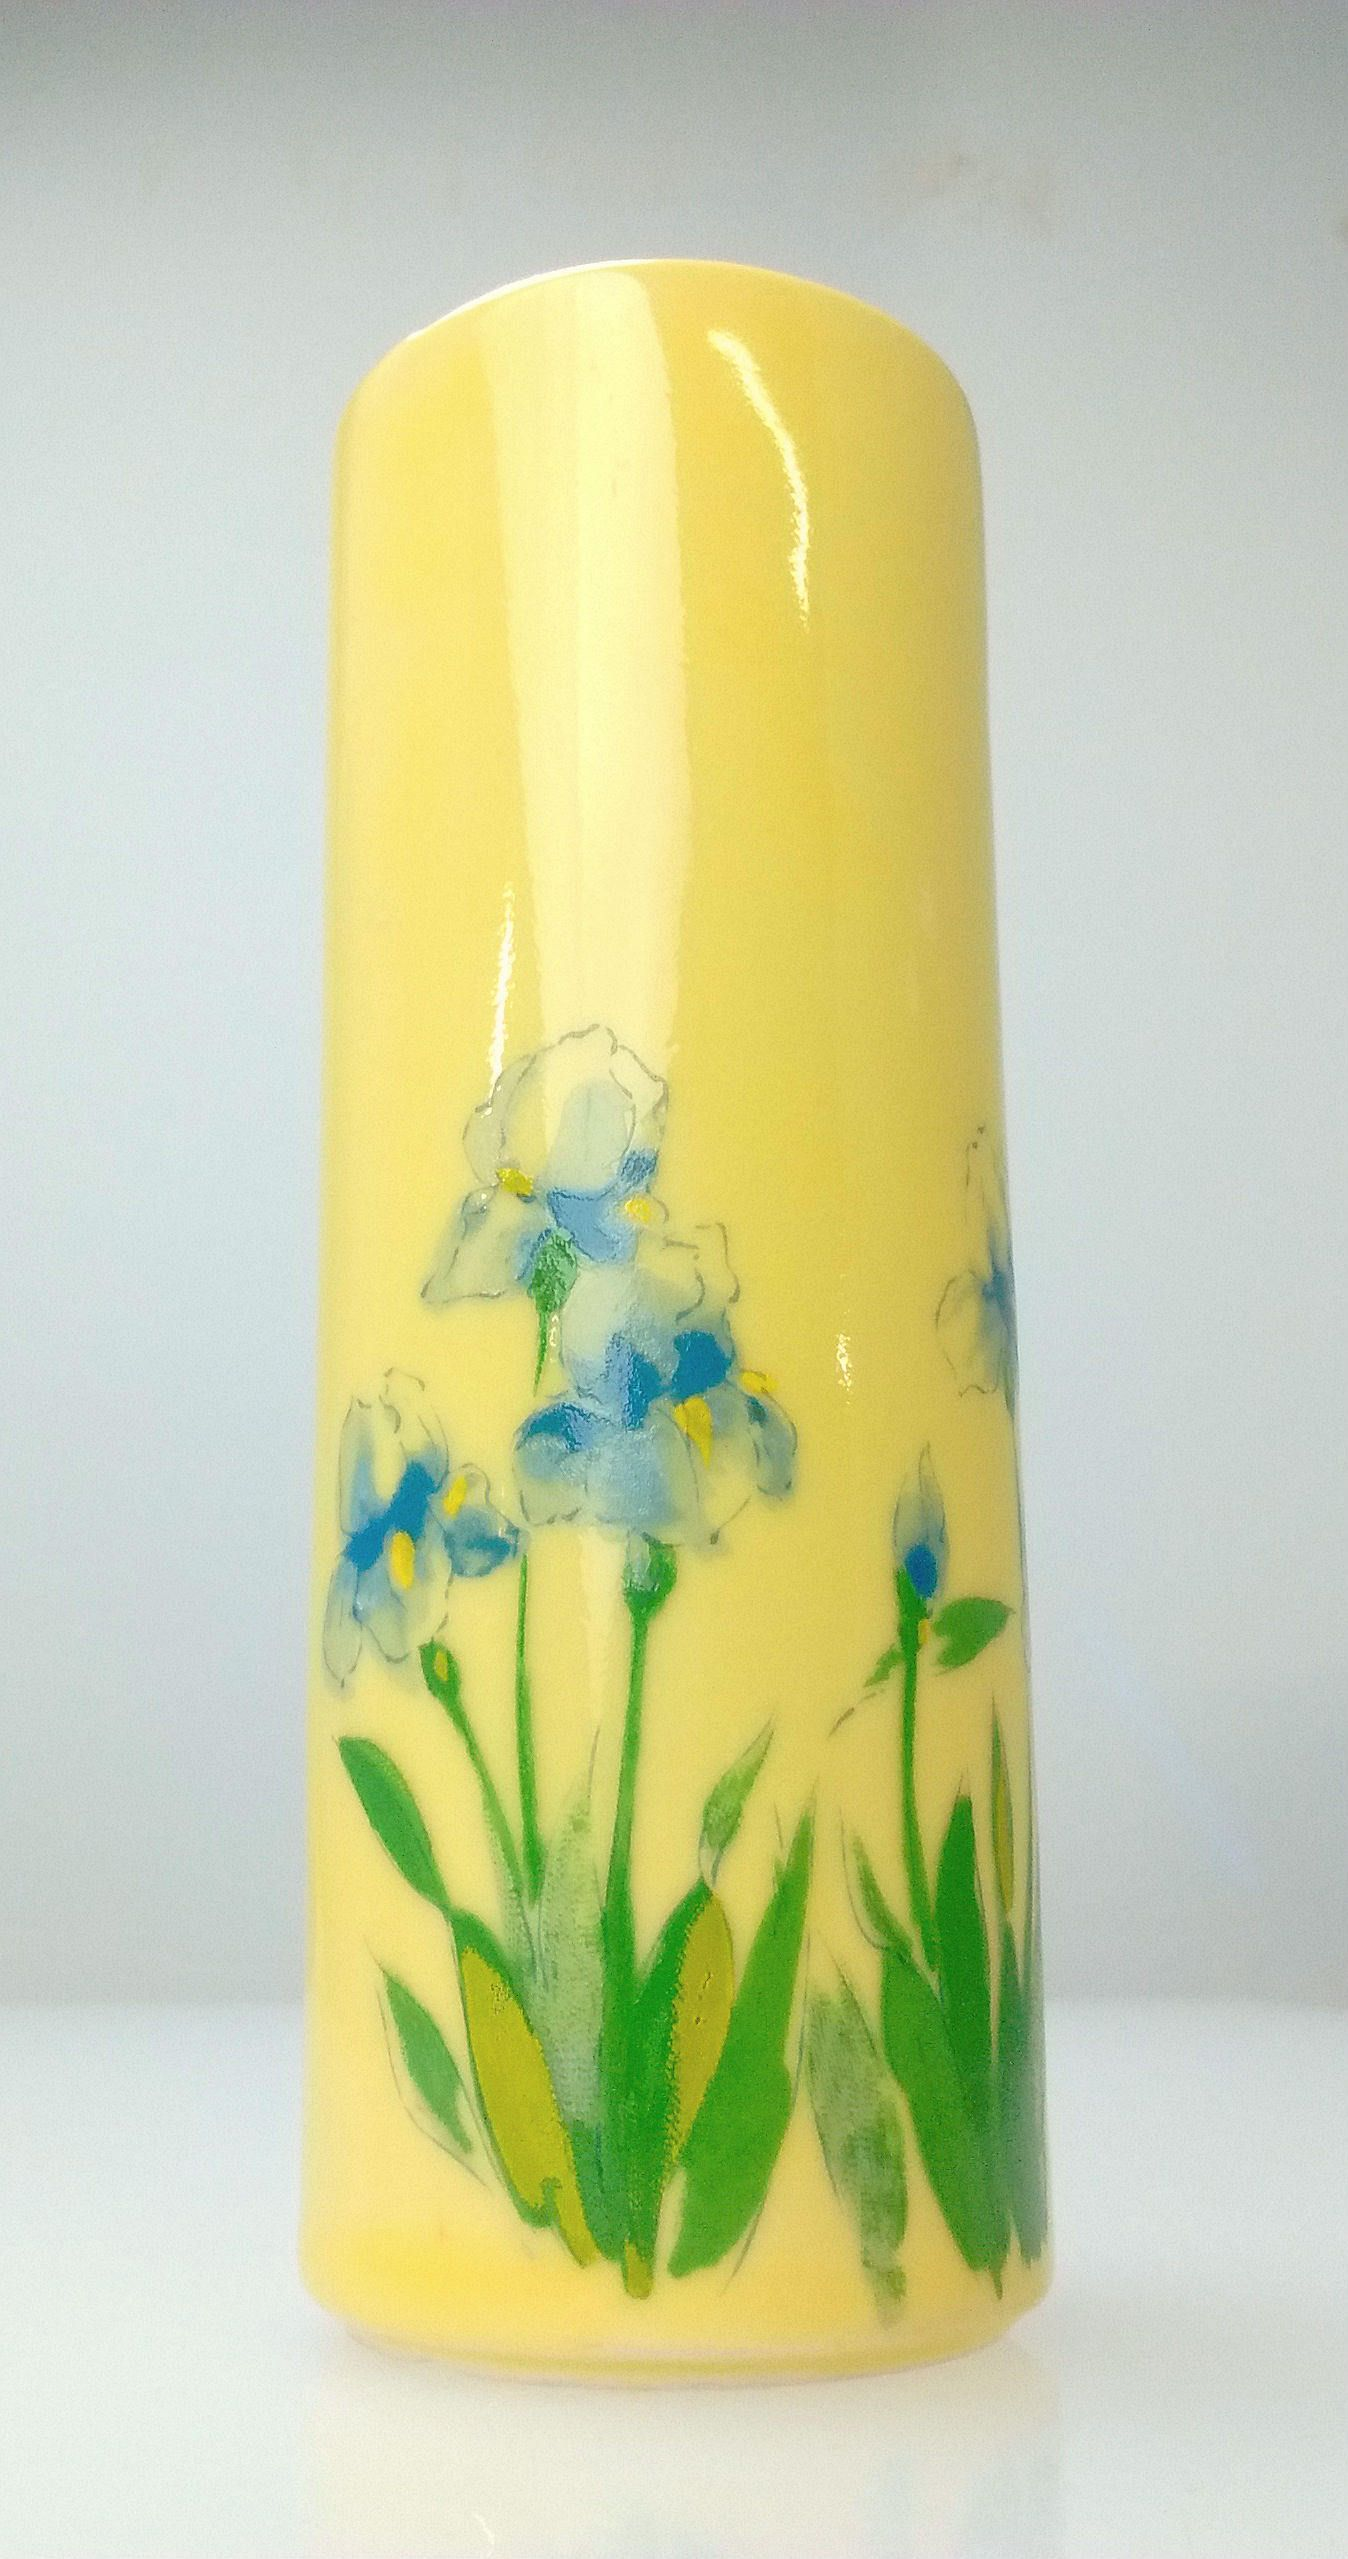 Vintage mccoy yellow blue iris 575 tall pattern 676 pottery bud vintage mccoy yellow blue iris 575 tall pattern 676 pottery bud vase 19045 by antiqueshack reviewsmspy